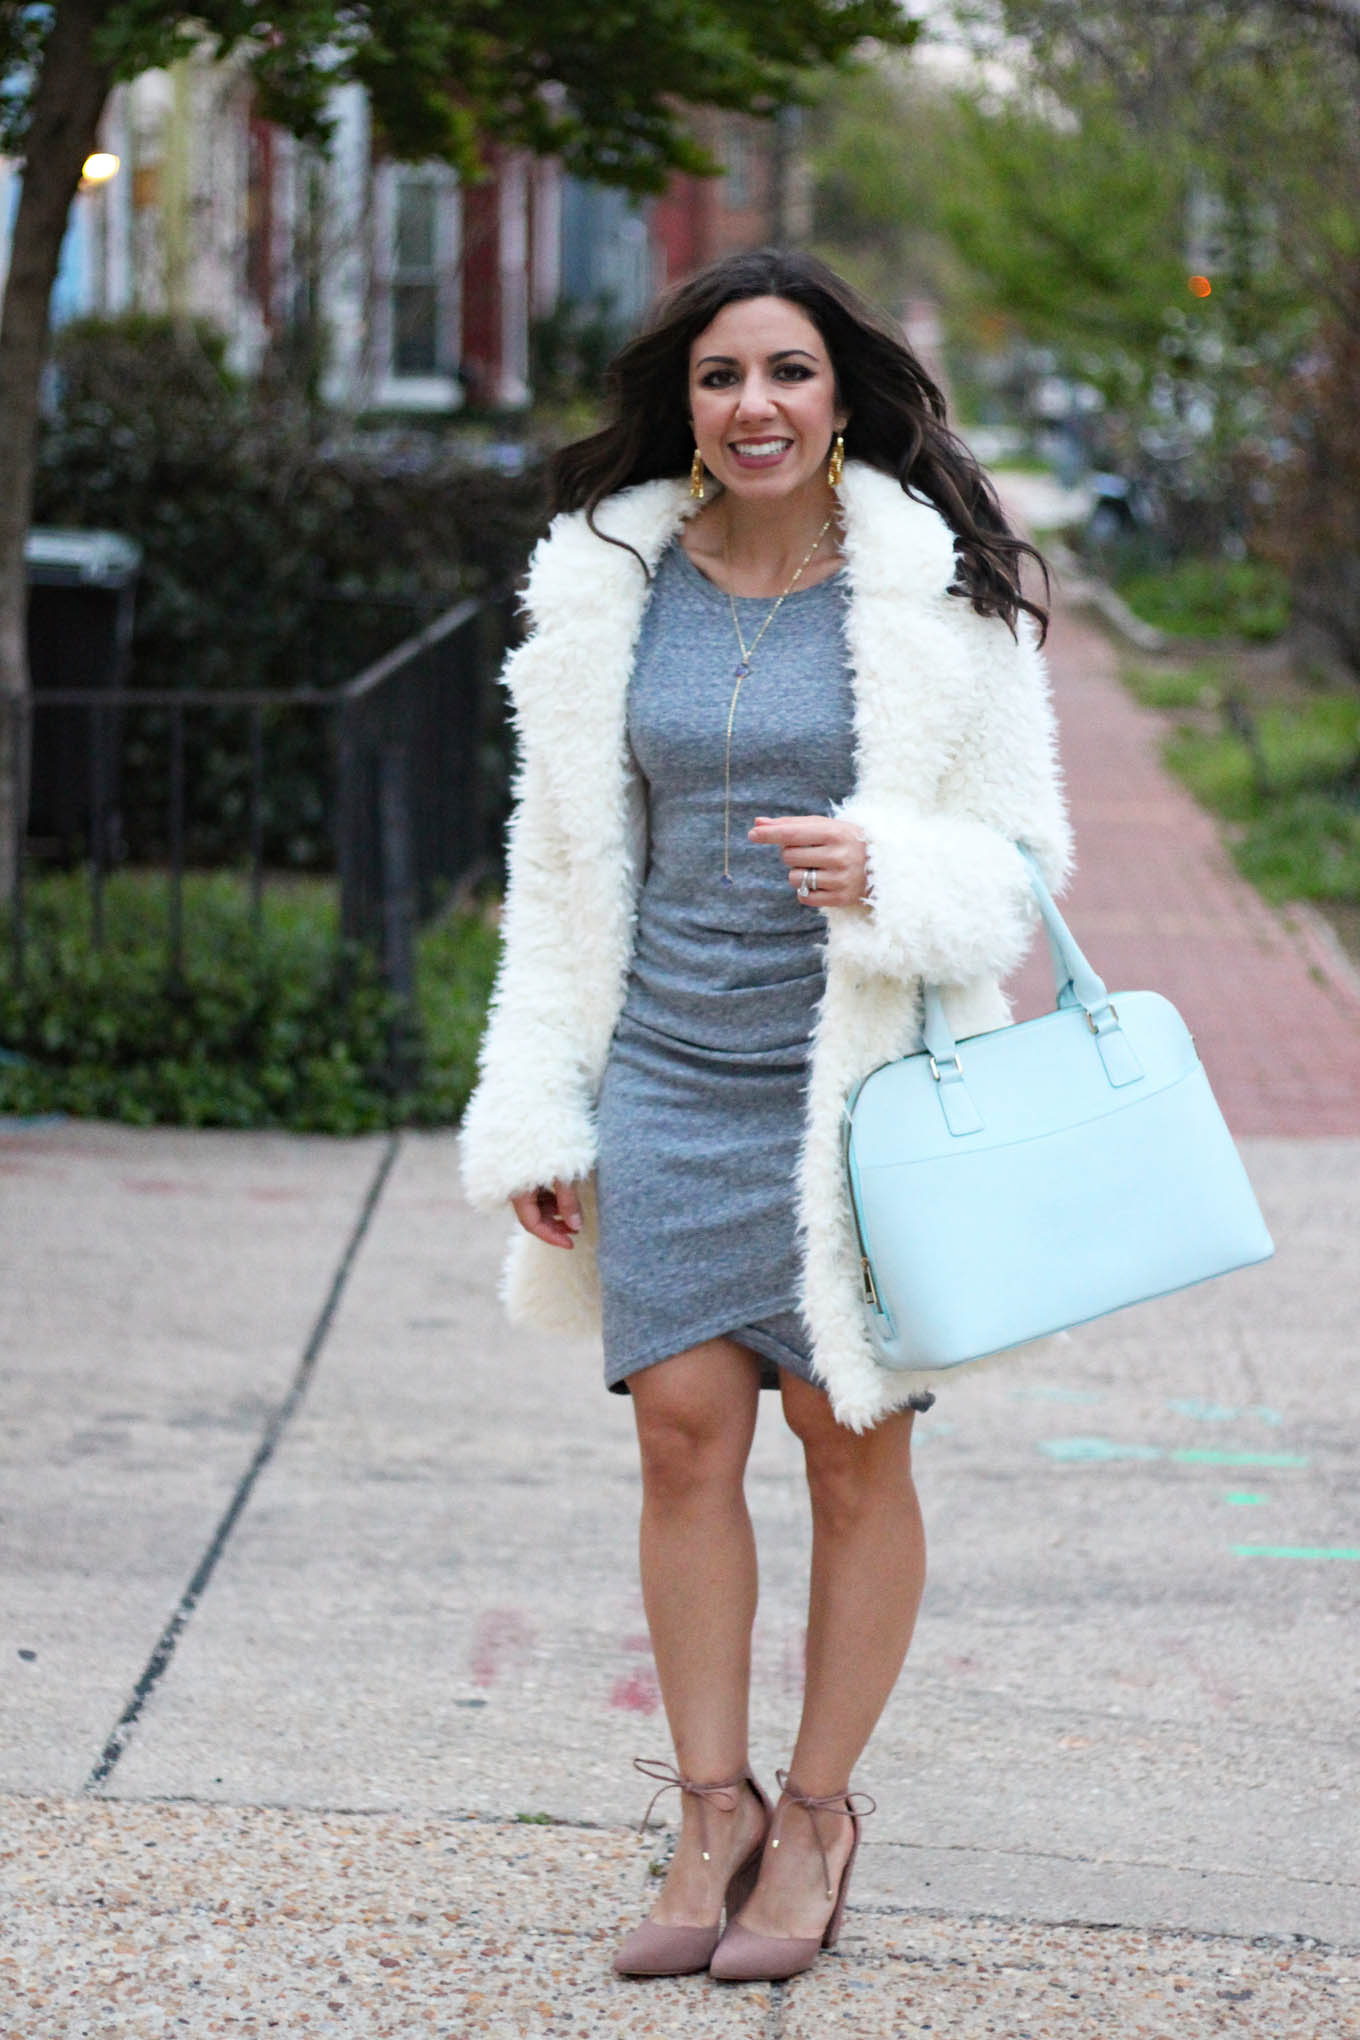 Lifestyle blogger Roxanne of Glass of Glam wearing a Boohoo Bear Coat, Mel Boteri bag, Nordstrom dress, Baublebar star earrings and Steve Madden Shoes